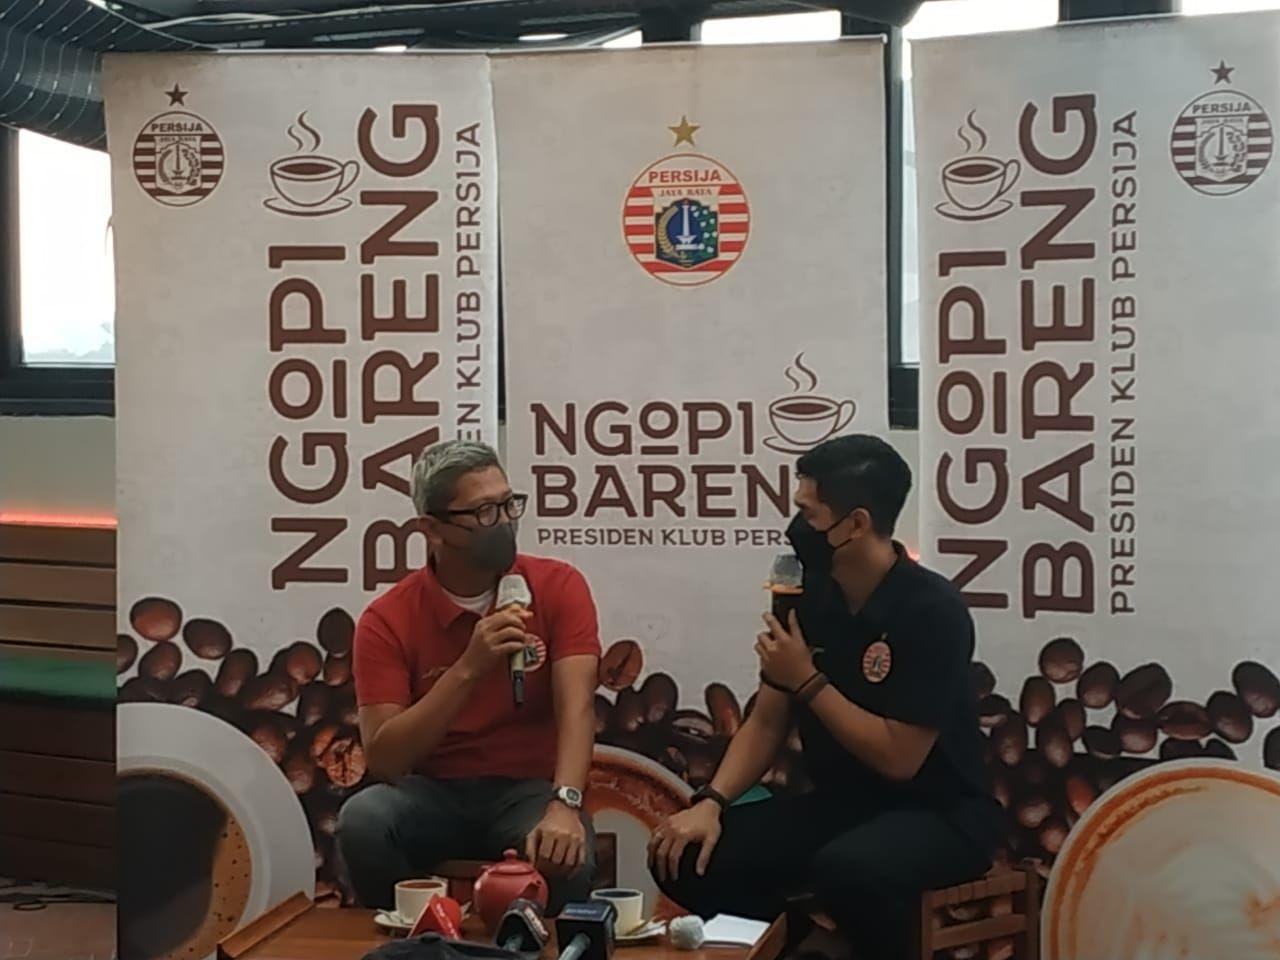 Presiden Persija Jakarta, Mohamad Prapanca (kiri), bersama manajer Persija, Bambang Pamungkas (kanan), dalam perkenalan pelatih baru Persija Jakarta di Monopoli Cafe, Kemang, Jakarta, Kamis (10/6/2021).